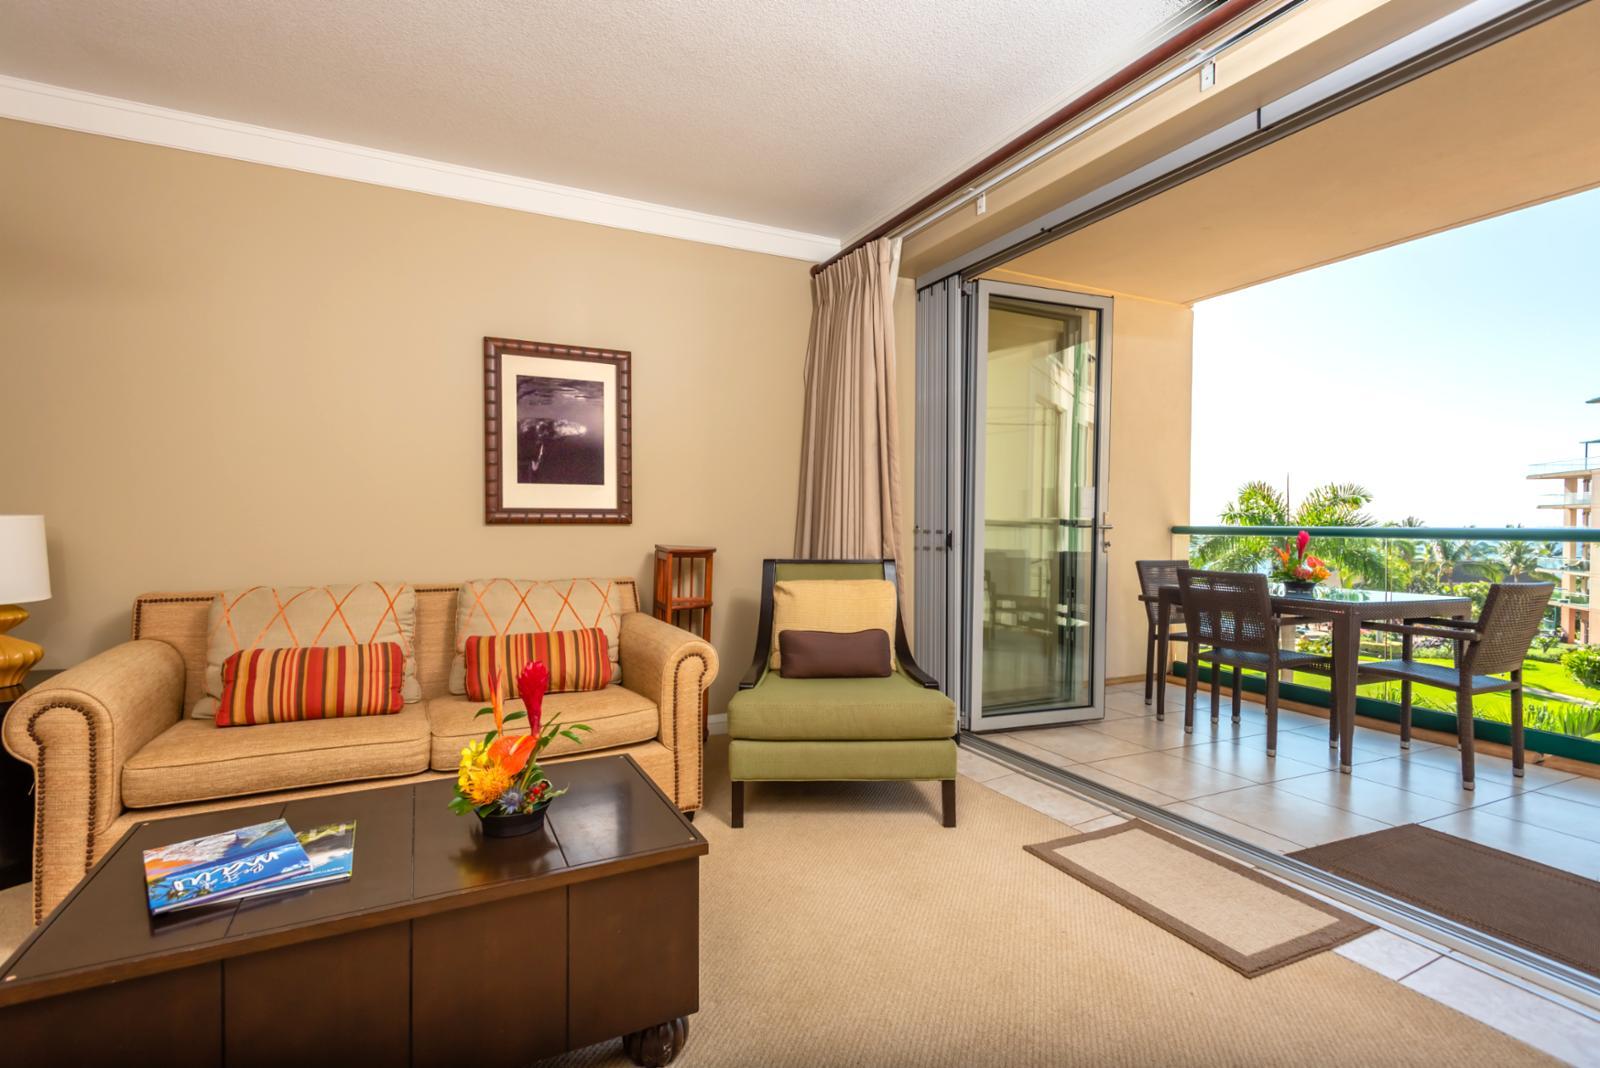 Indoor and outdoor living at its finest - luxury Nano doors